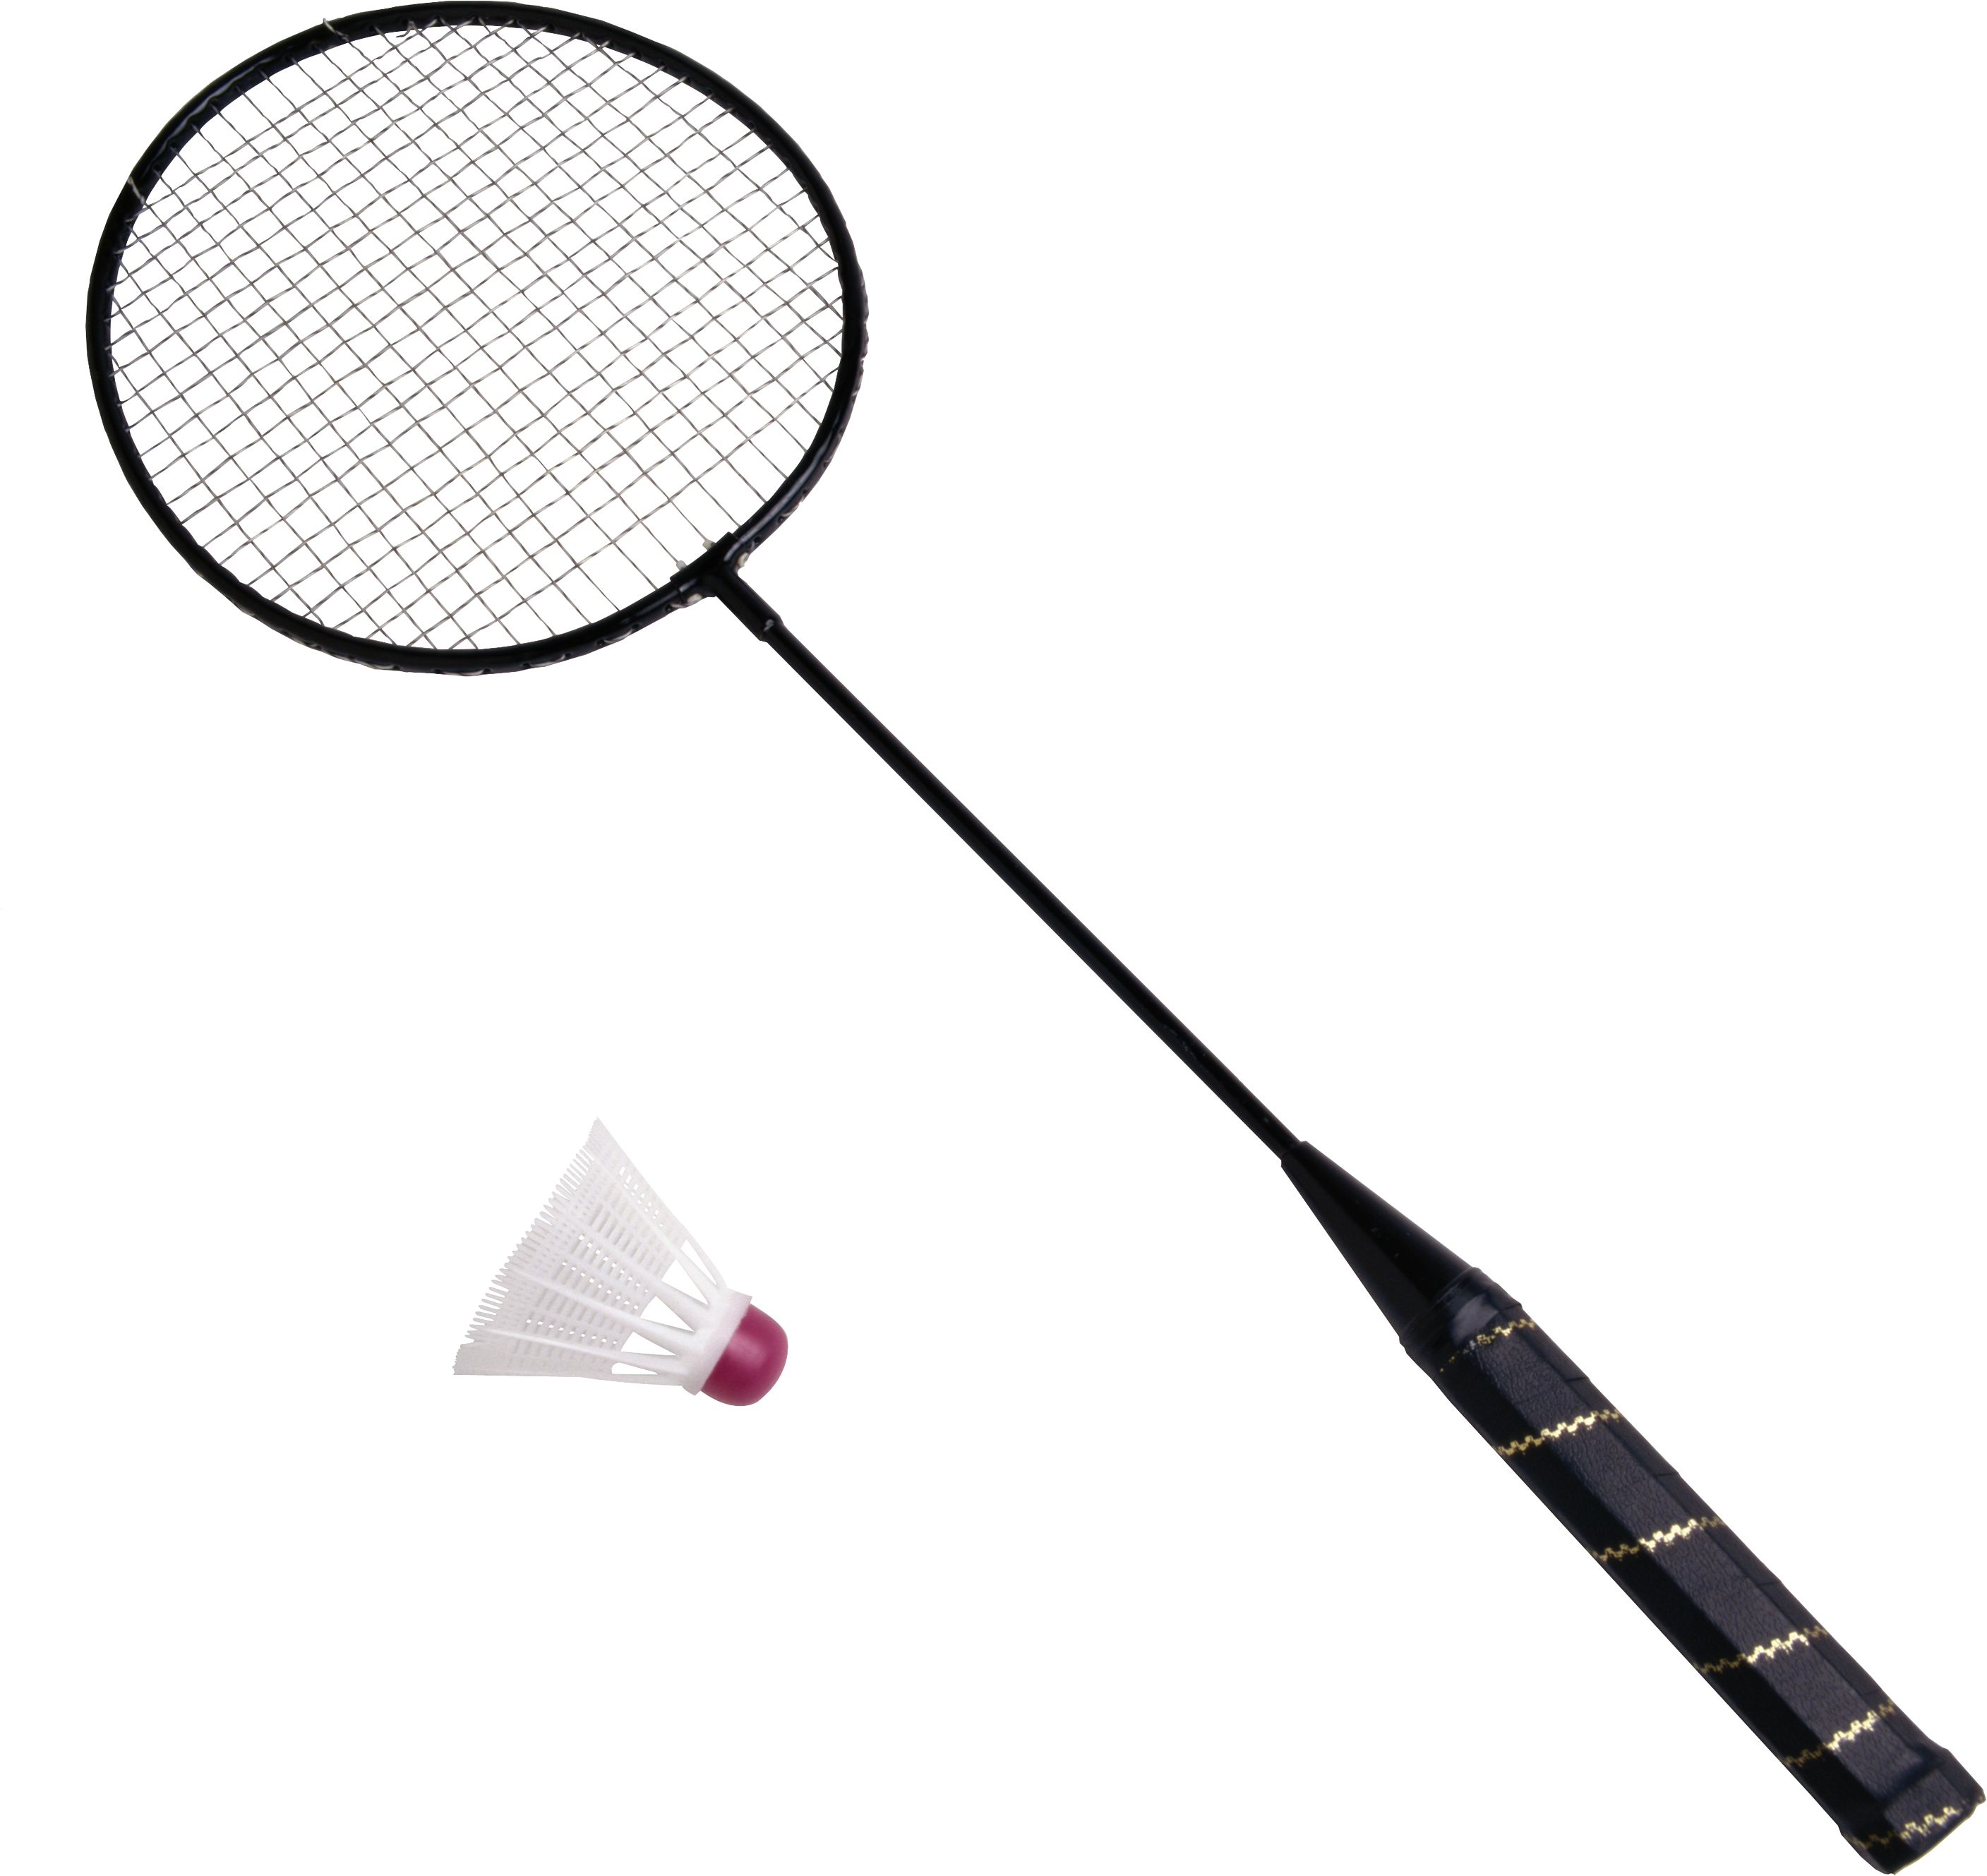 Badminton Racket Png Image Badminton Racket Badminton Rackets